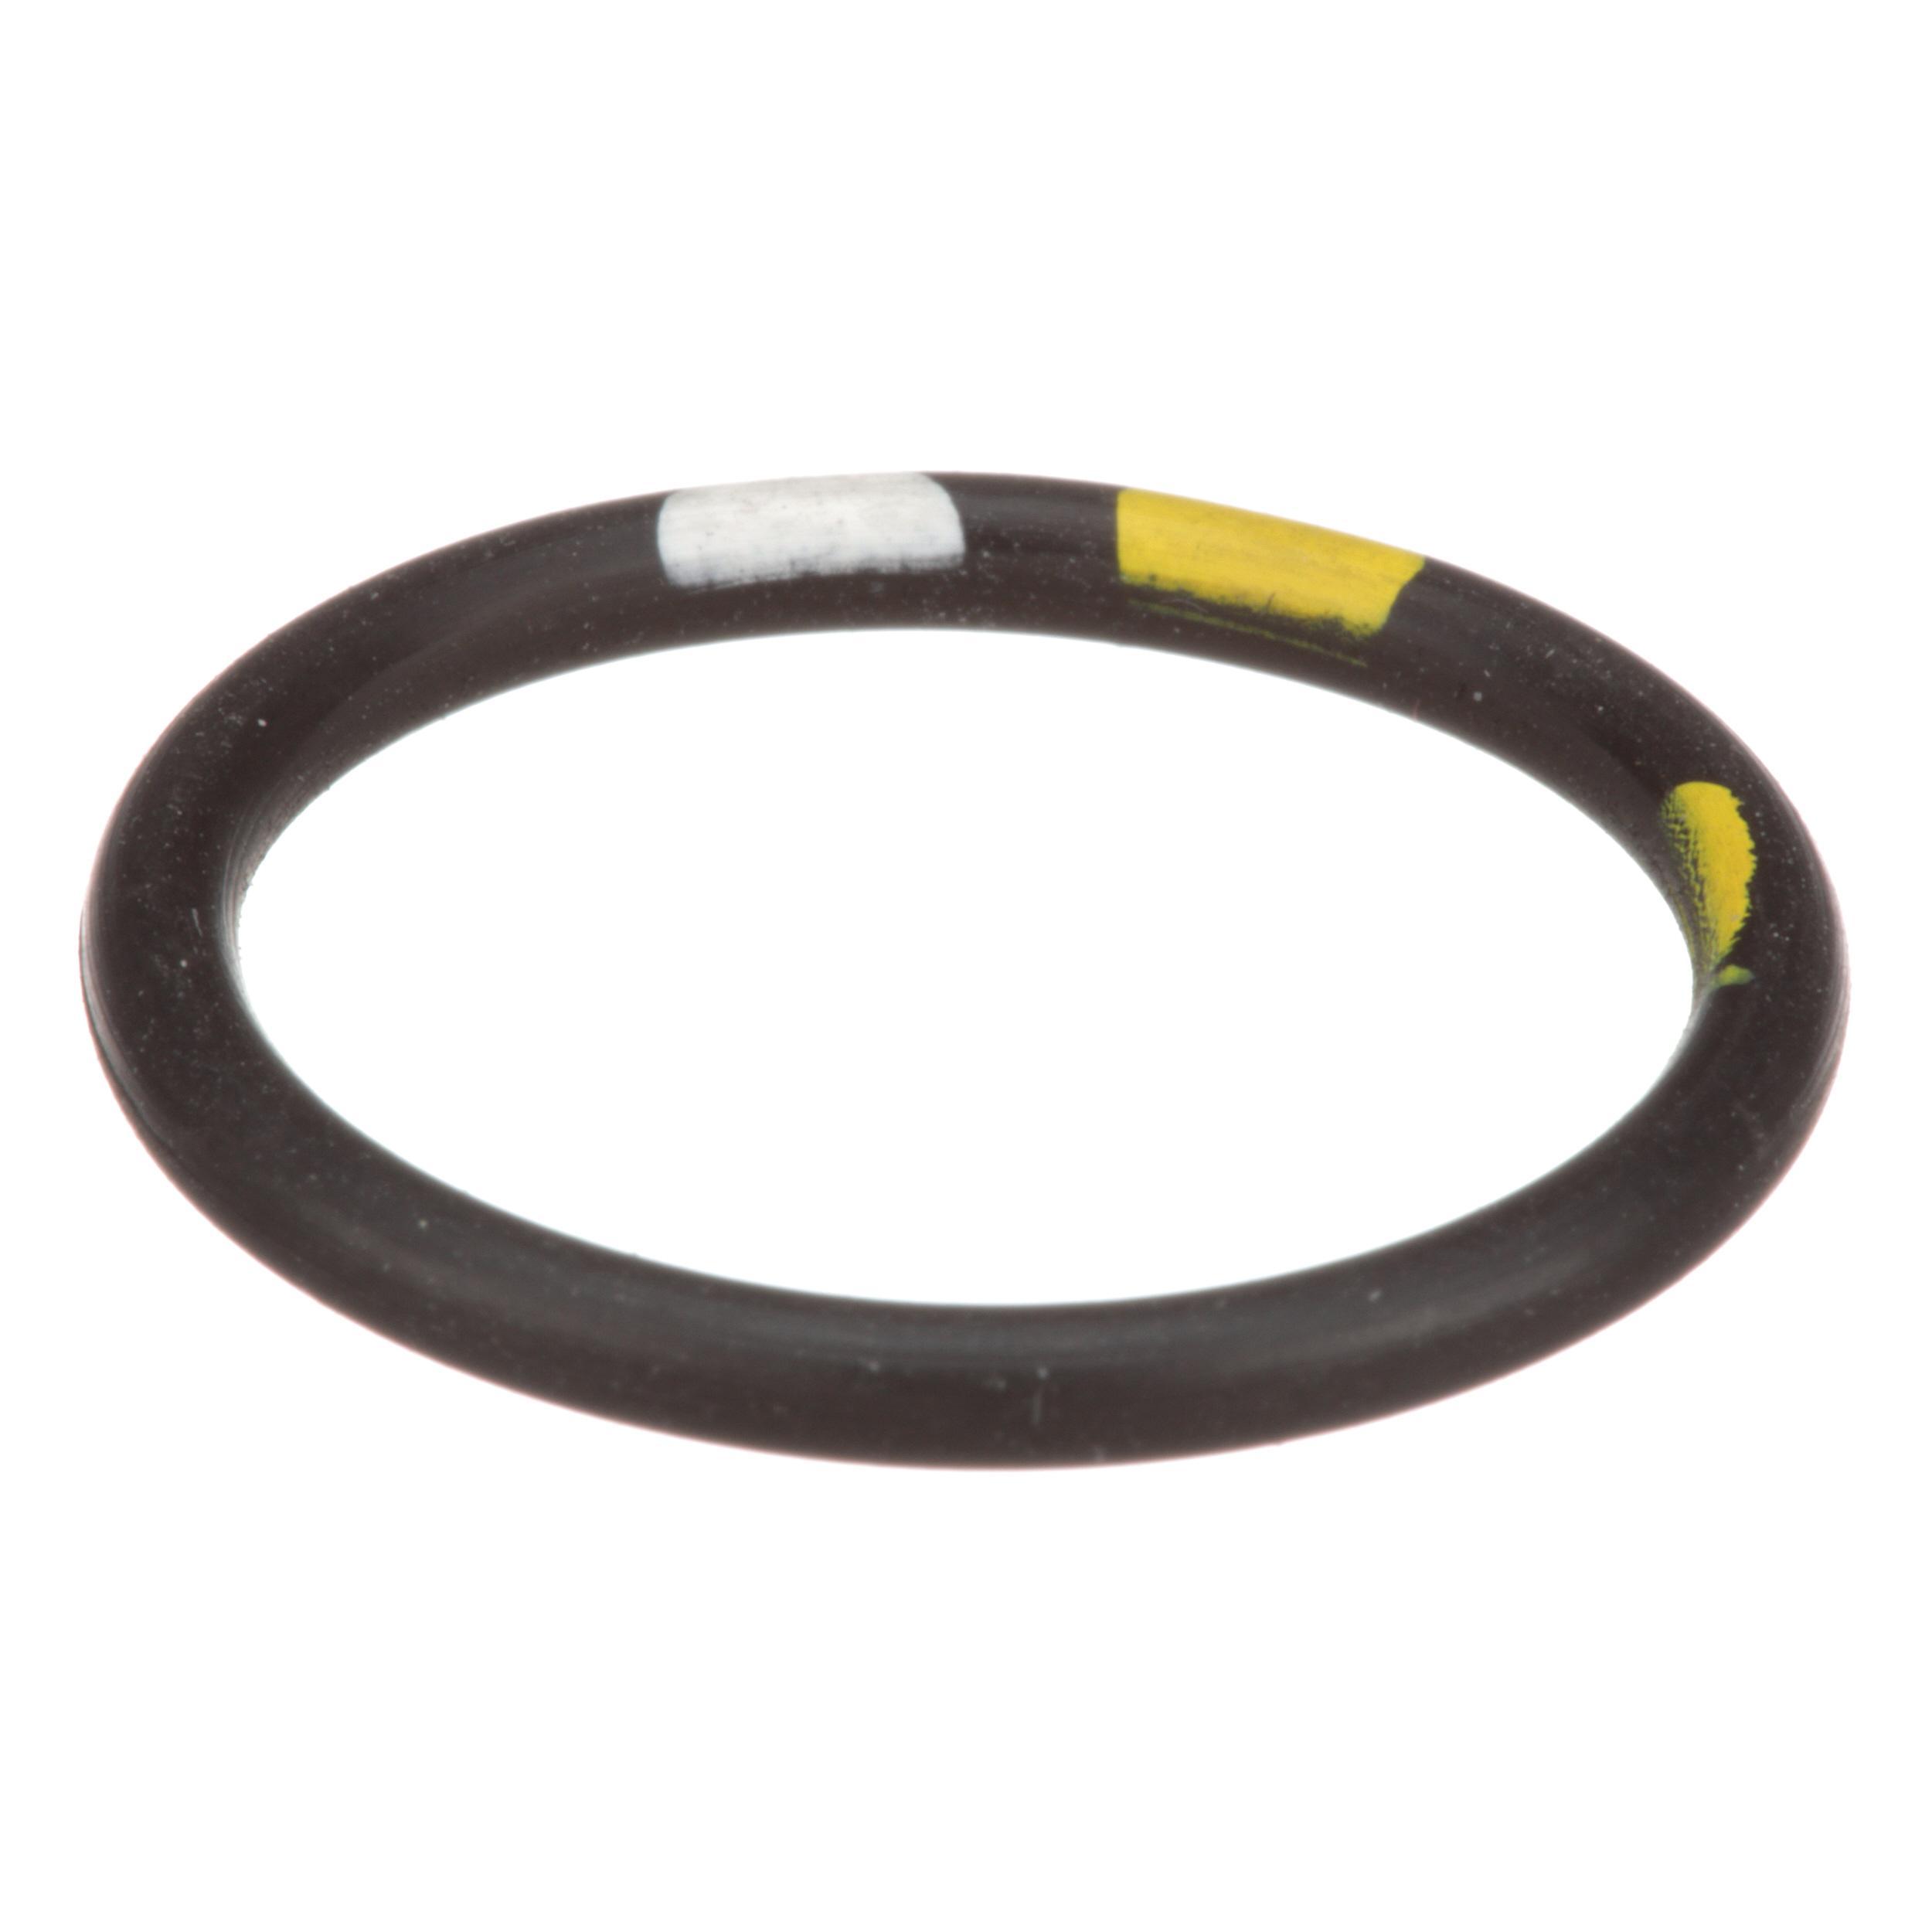 CLEVELAND O-RING;EPDM-E515 (A-016)